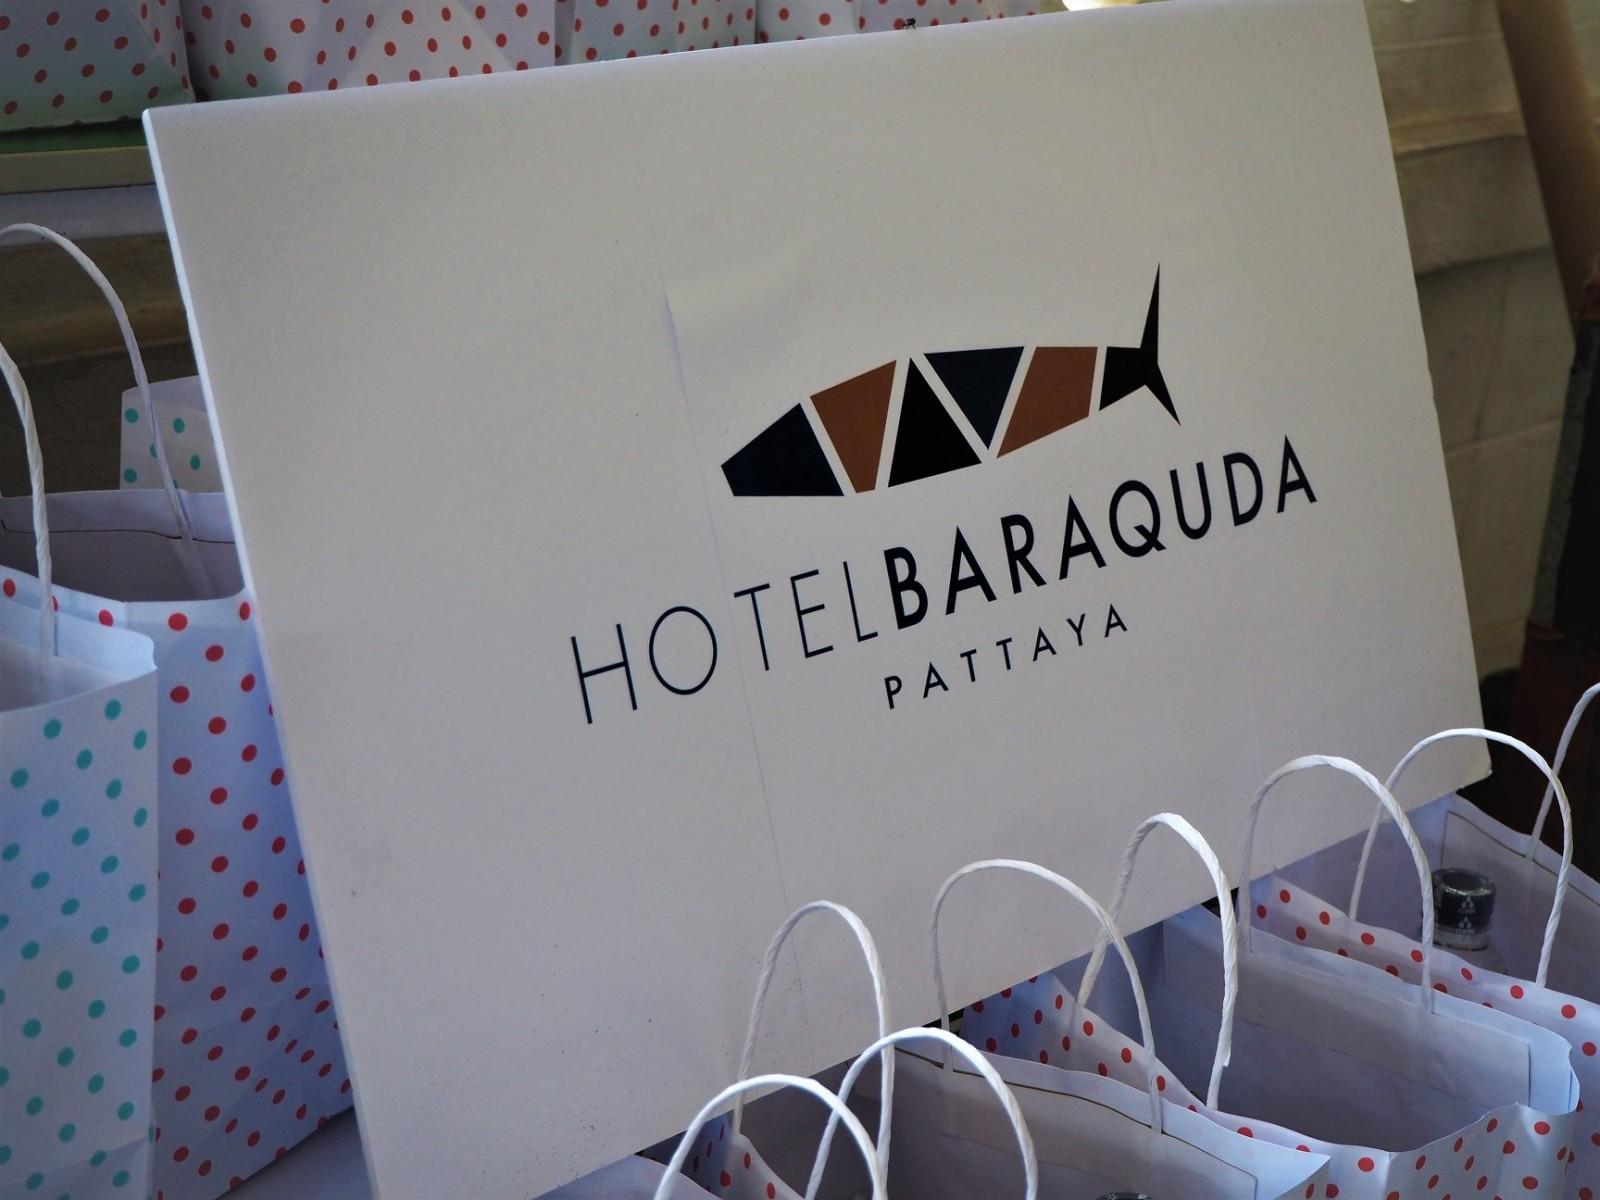 baraquda-pattaya-visit-hand-to-hand-foundation